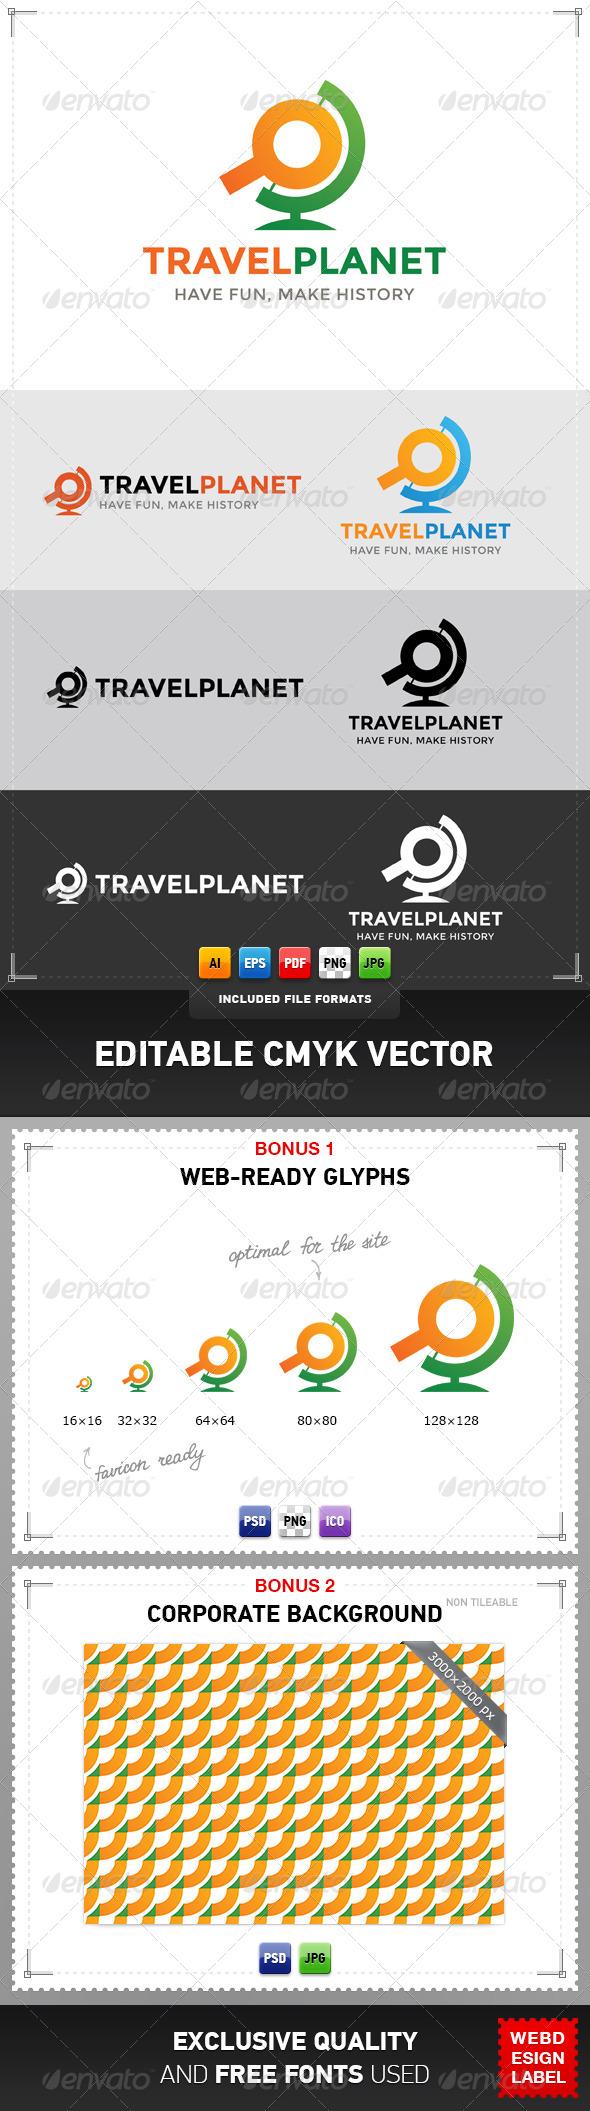 Travel Planet Logo - Objects Logo Templates